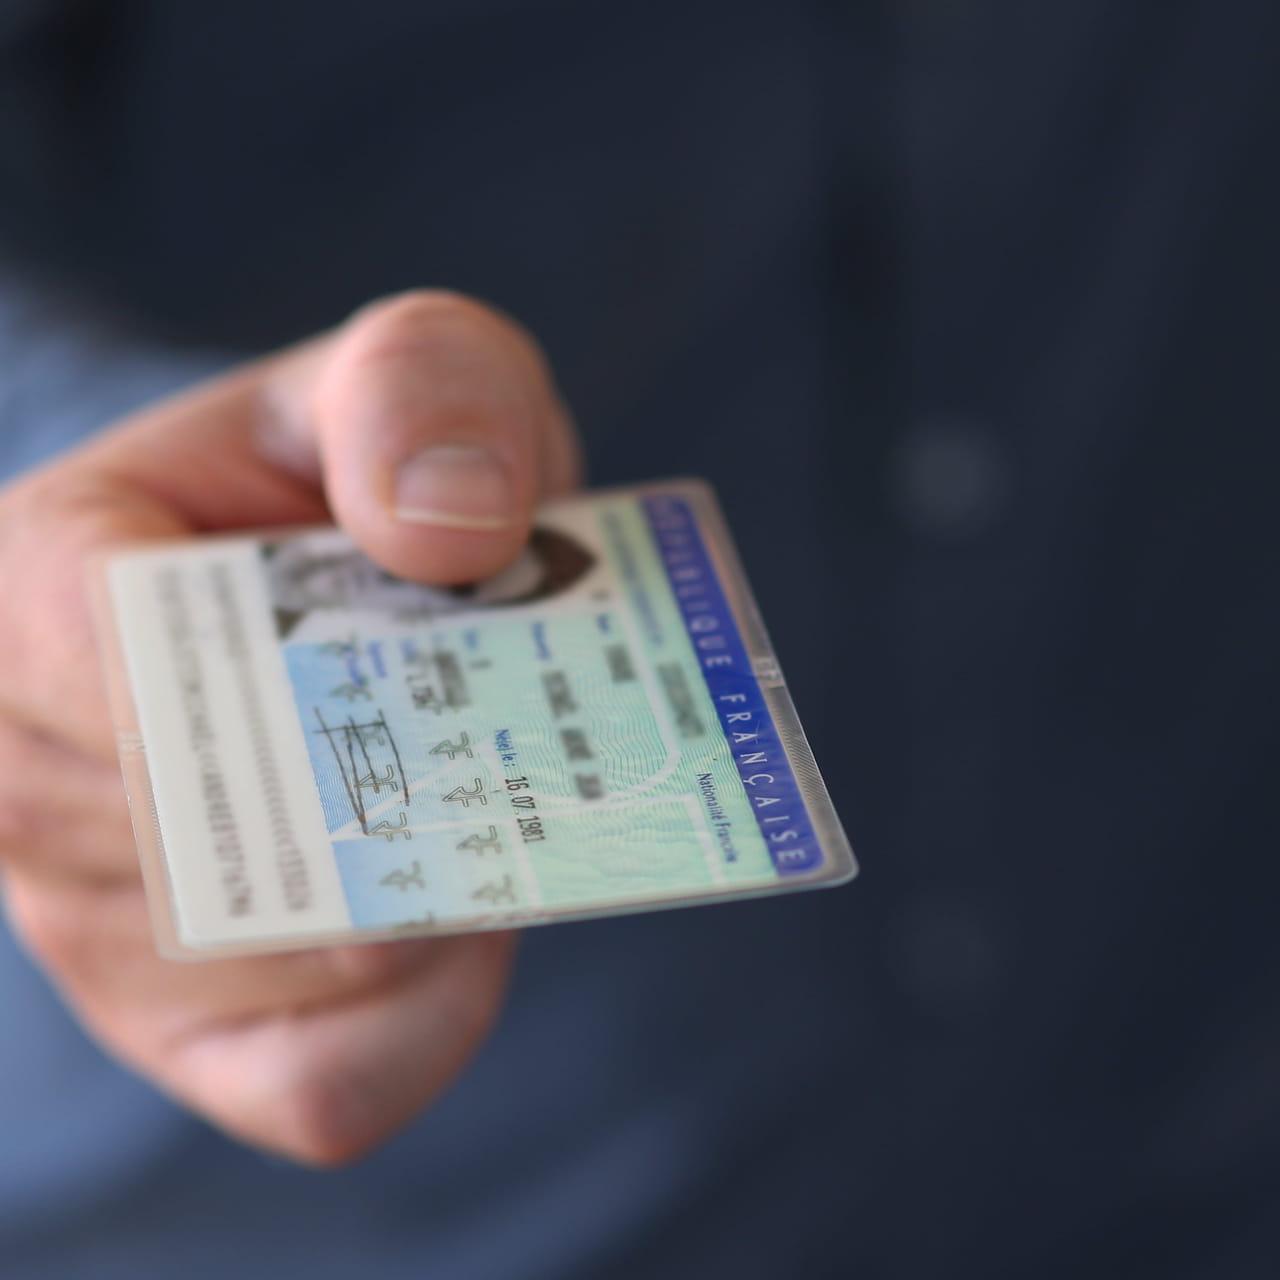 Modele Carte Identite Italienne.Validite Prolongee De La Carte D Identite Quelle Date